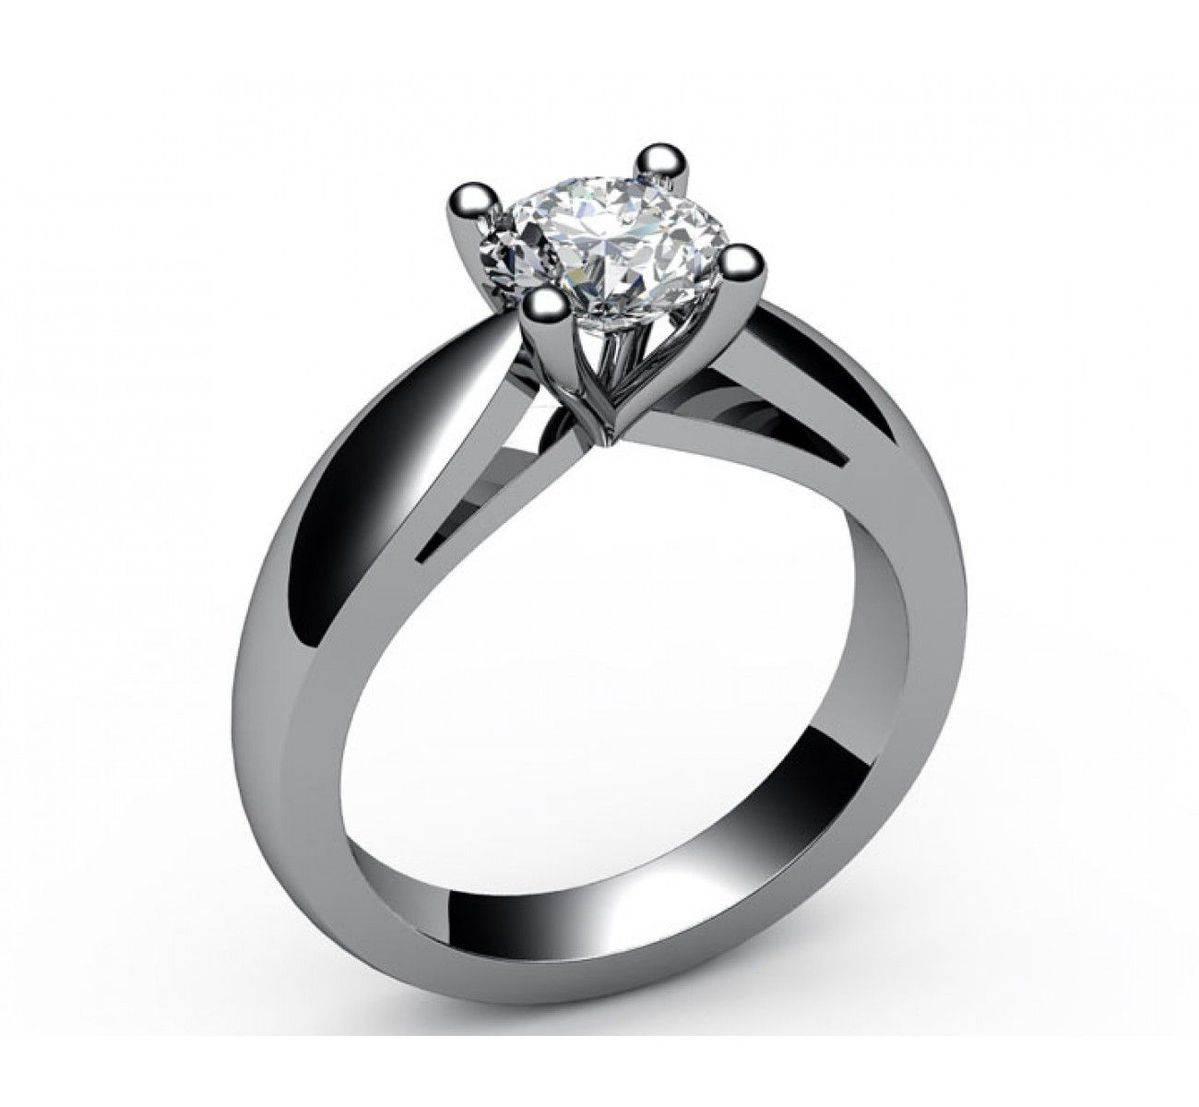 bars jewelry-384143043214393665